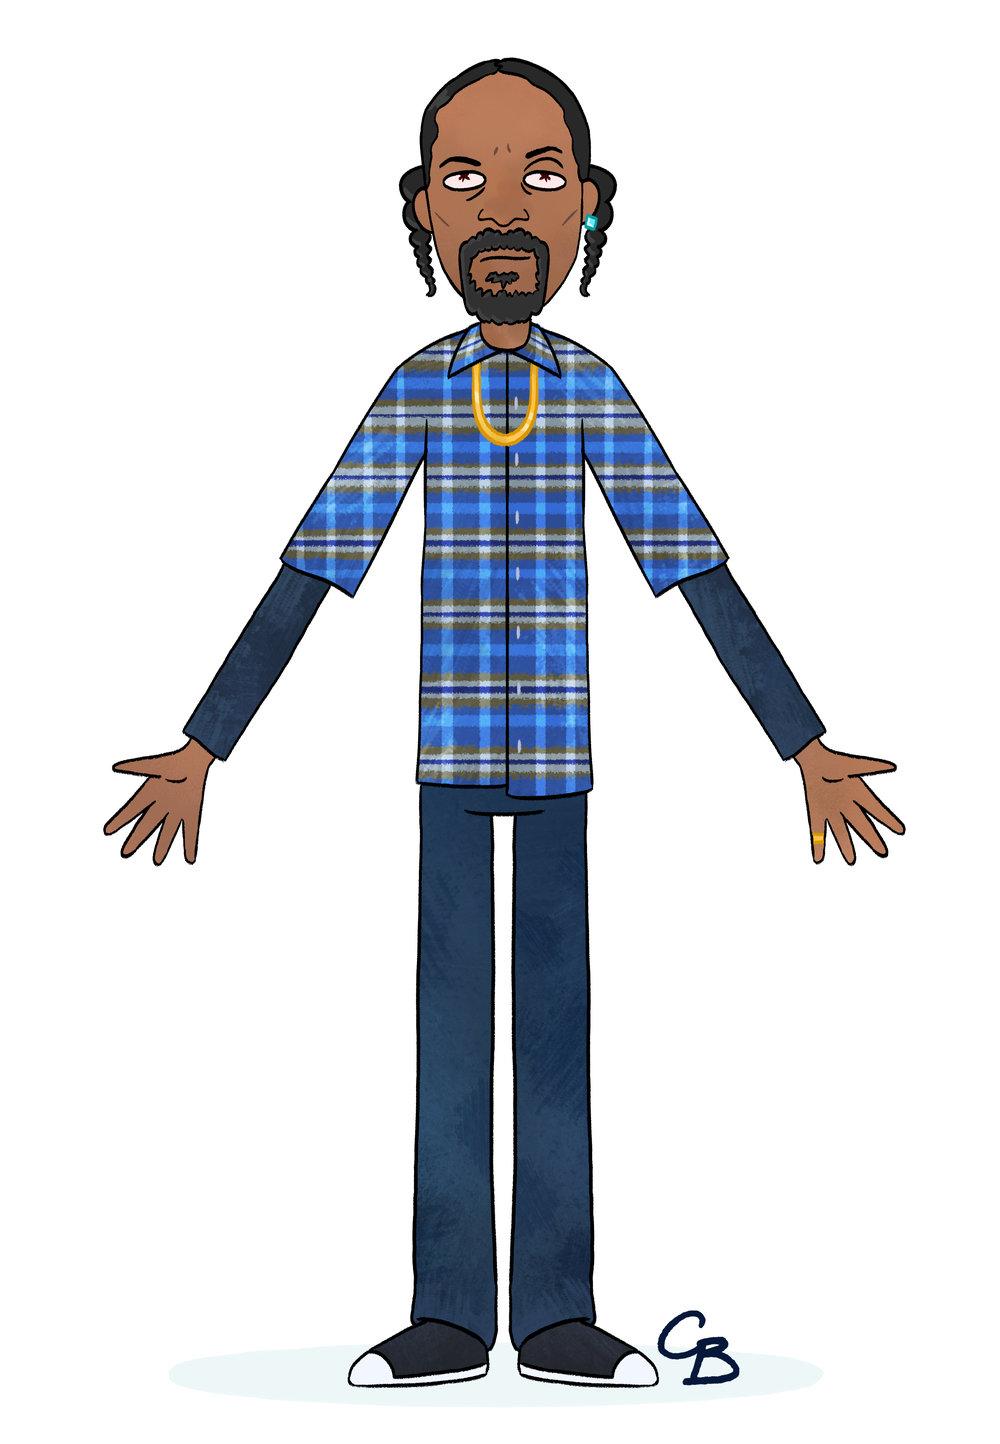 Snoop Dogg x Rick and Morty